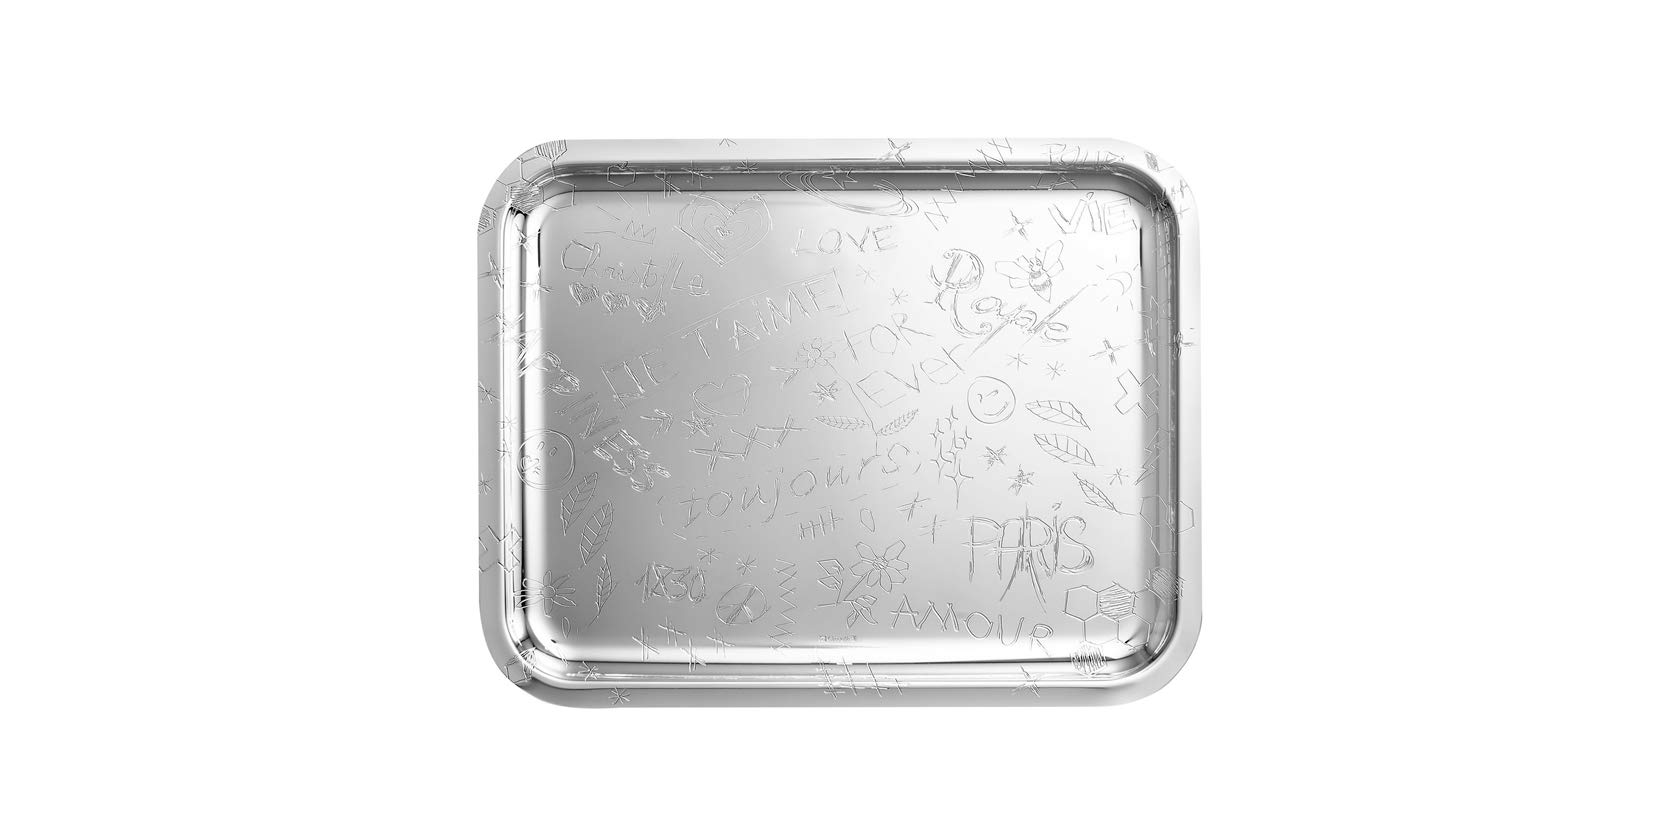 Christofle Graffiti Silver Plated Rectangular Tray #4200445 by Christofle (Image #1)